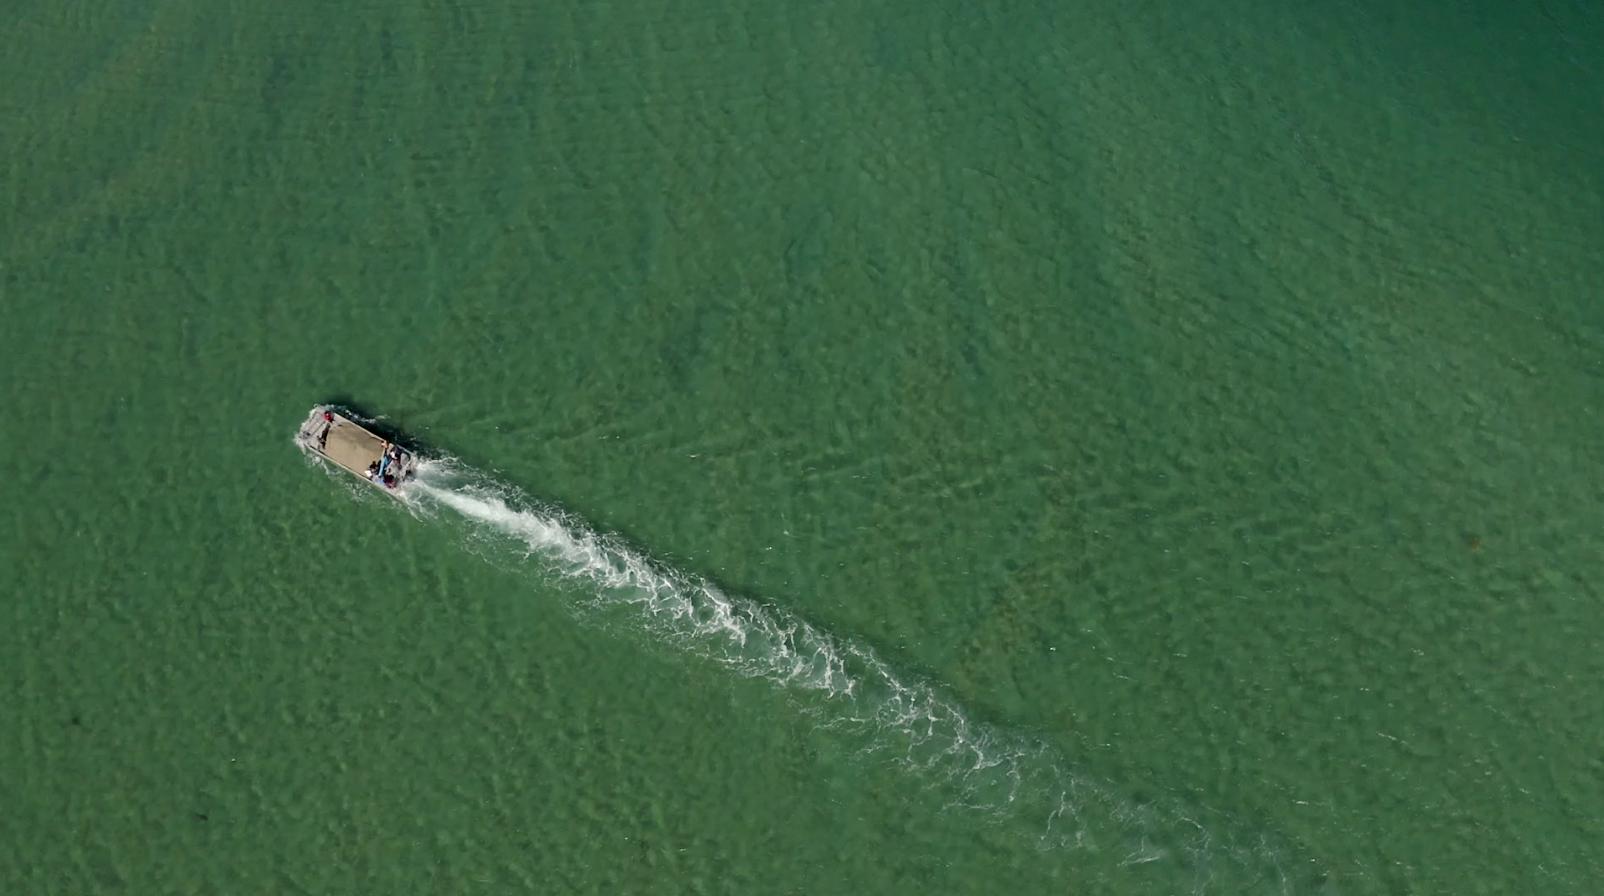 Kayak vers les îles Chausey - Expérience